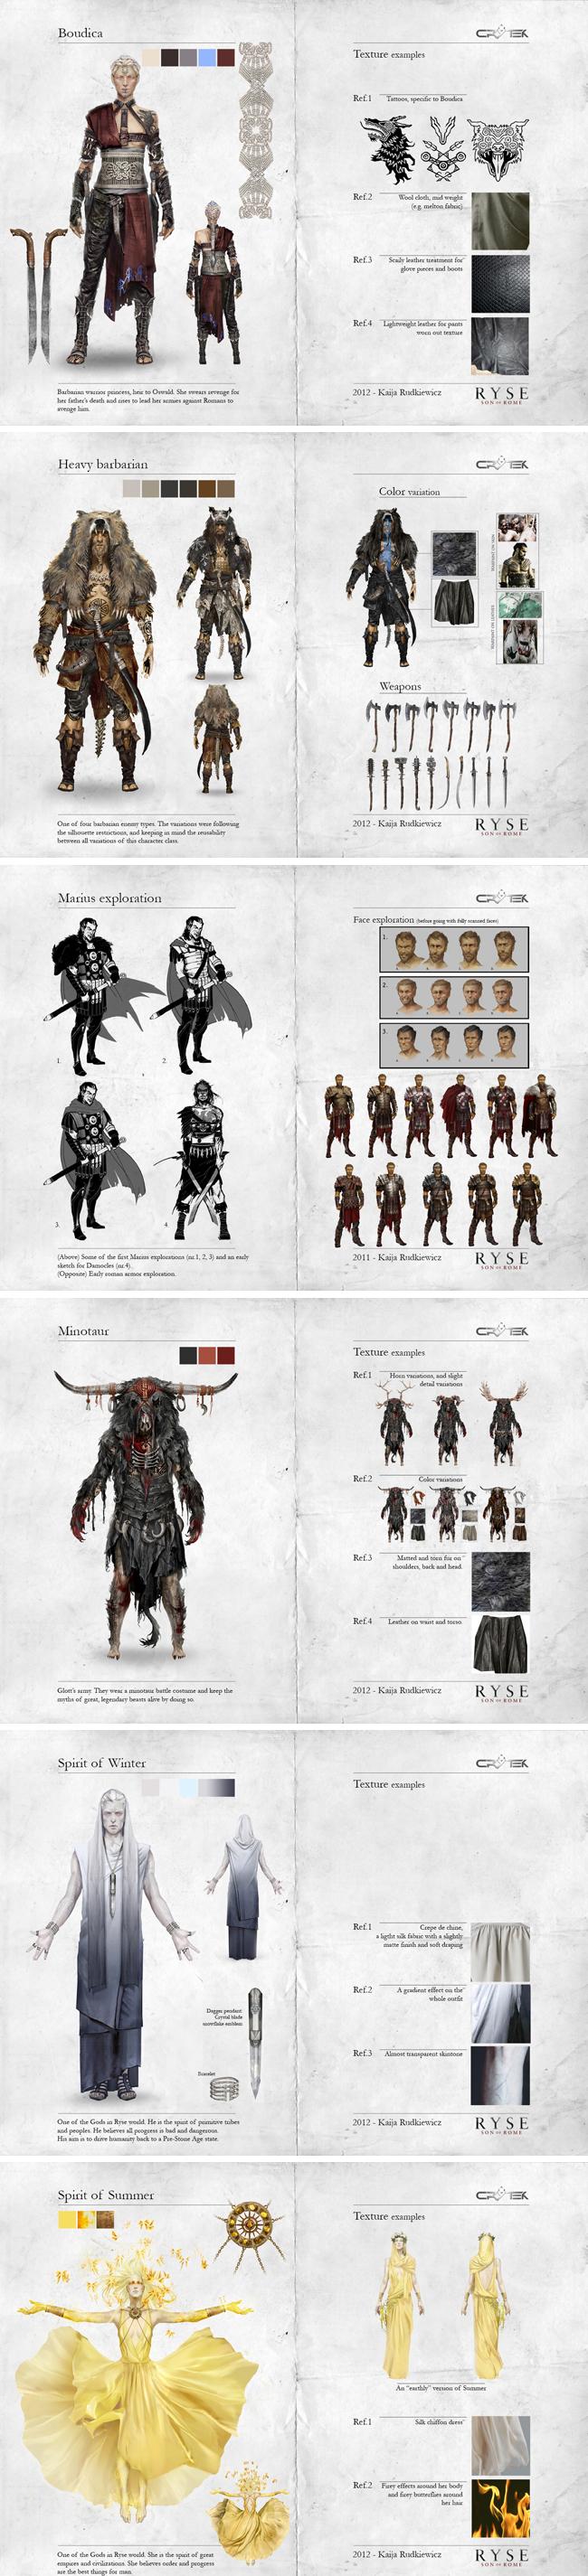 concept-art-madrid-articulos-digital-ilustracion-tradicional-academiac10